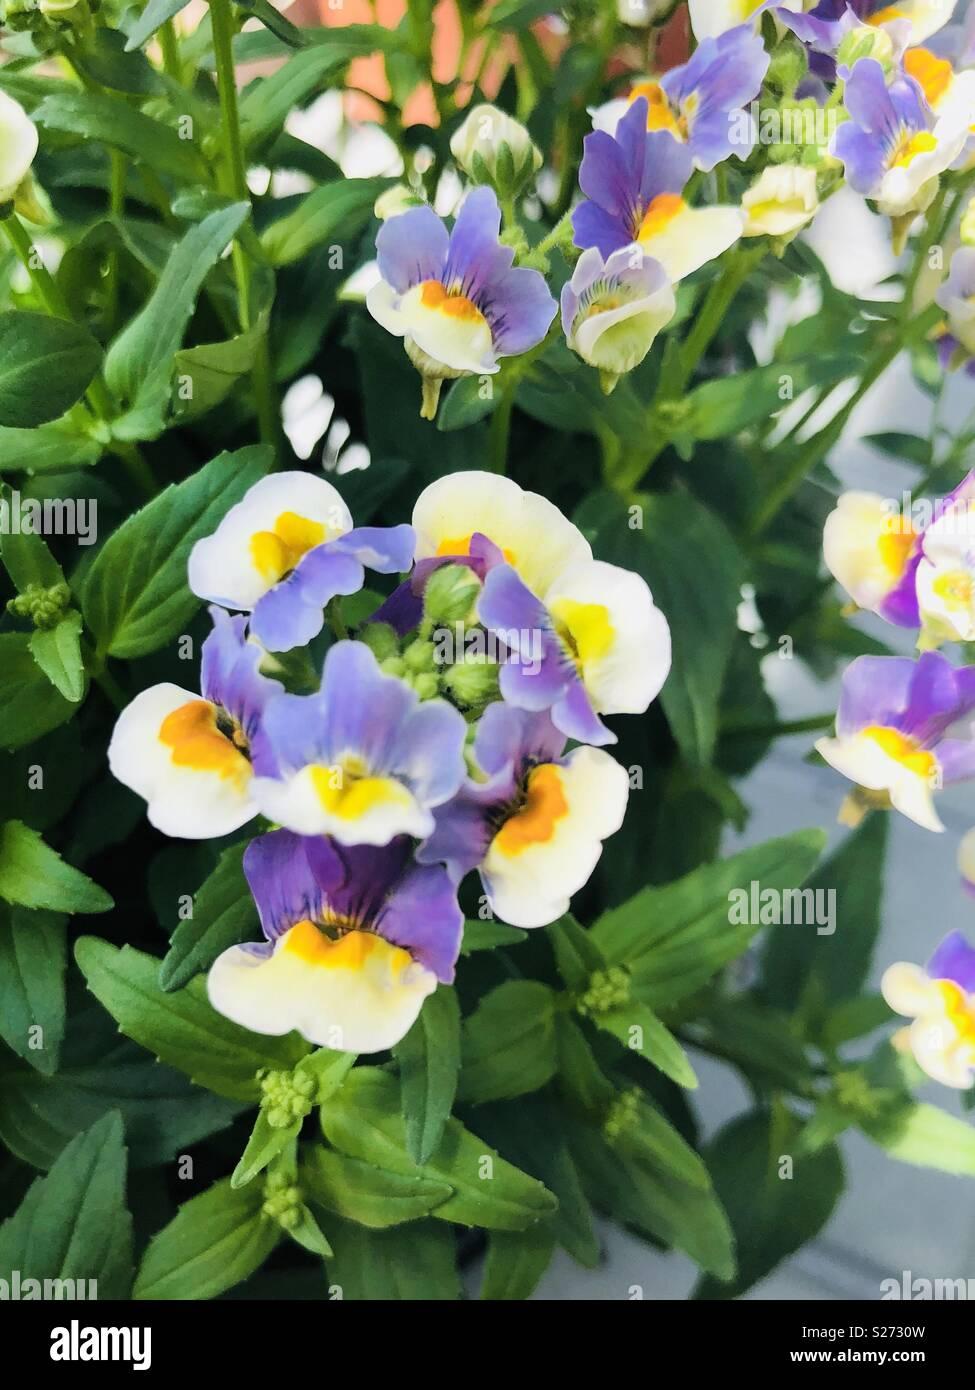 Nemesia Olivia flowers Stock Photo